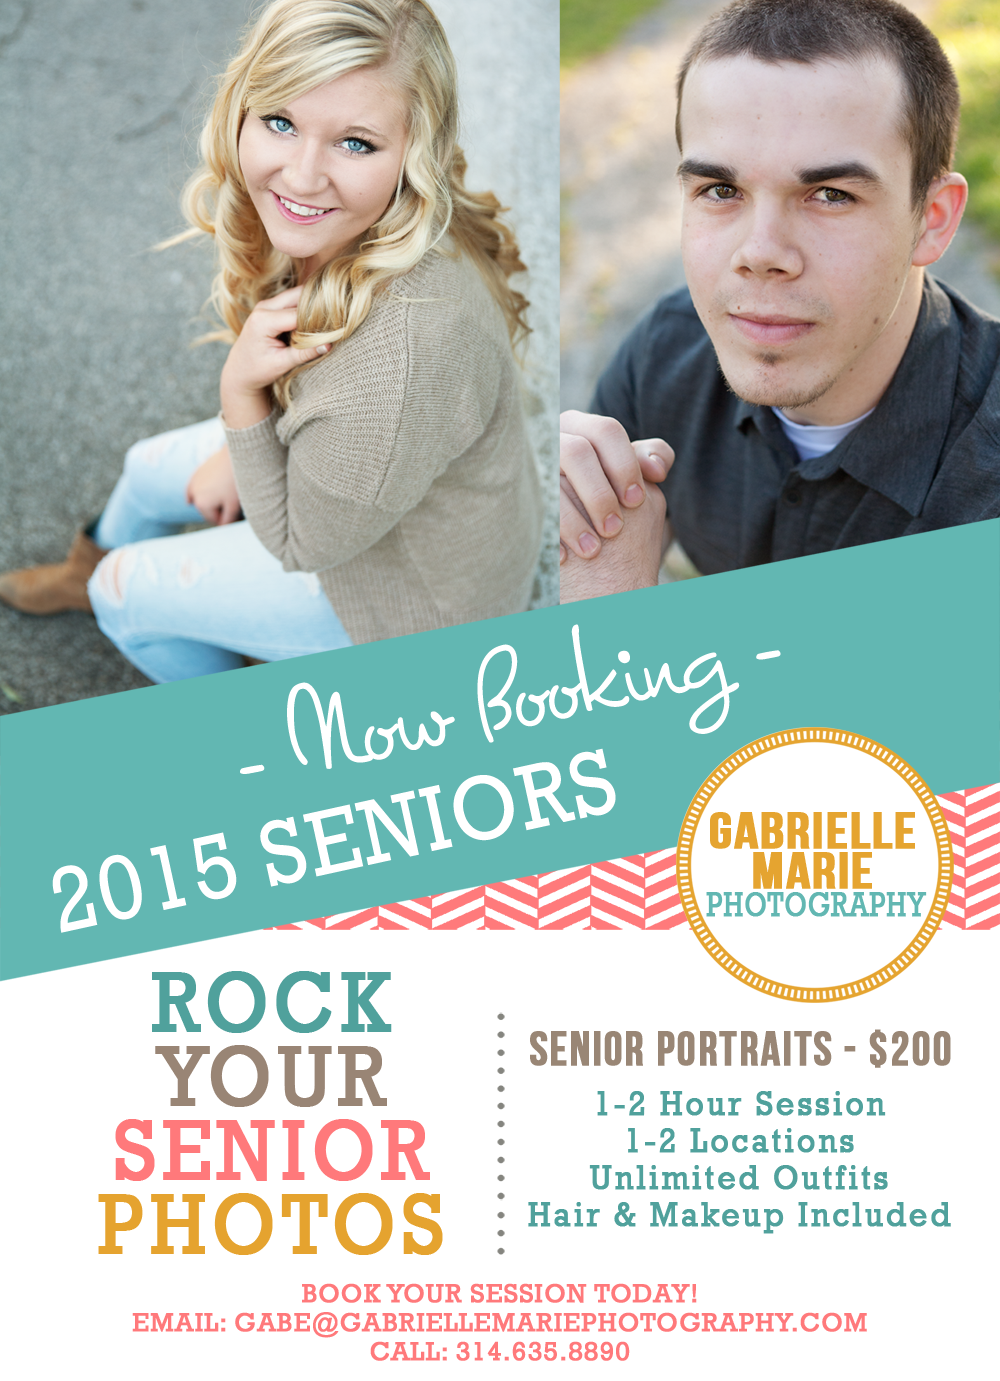 2015 senior pictures, St. Louis Senior photos, 2015 seniors, fun and creative senior portraits